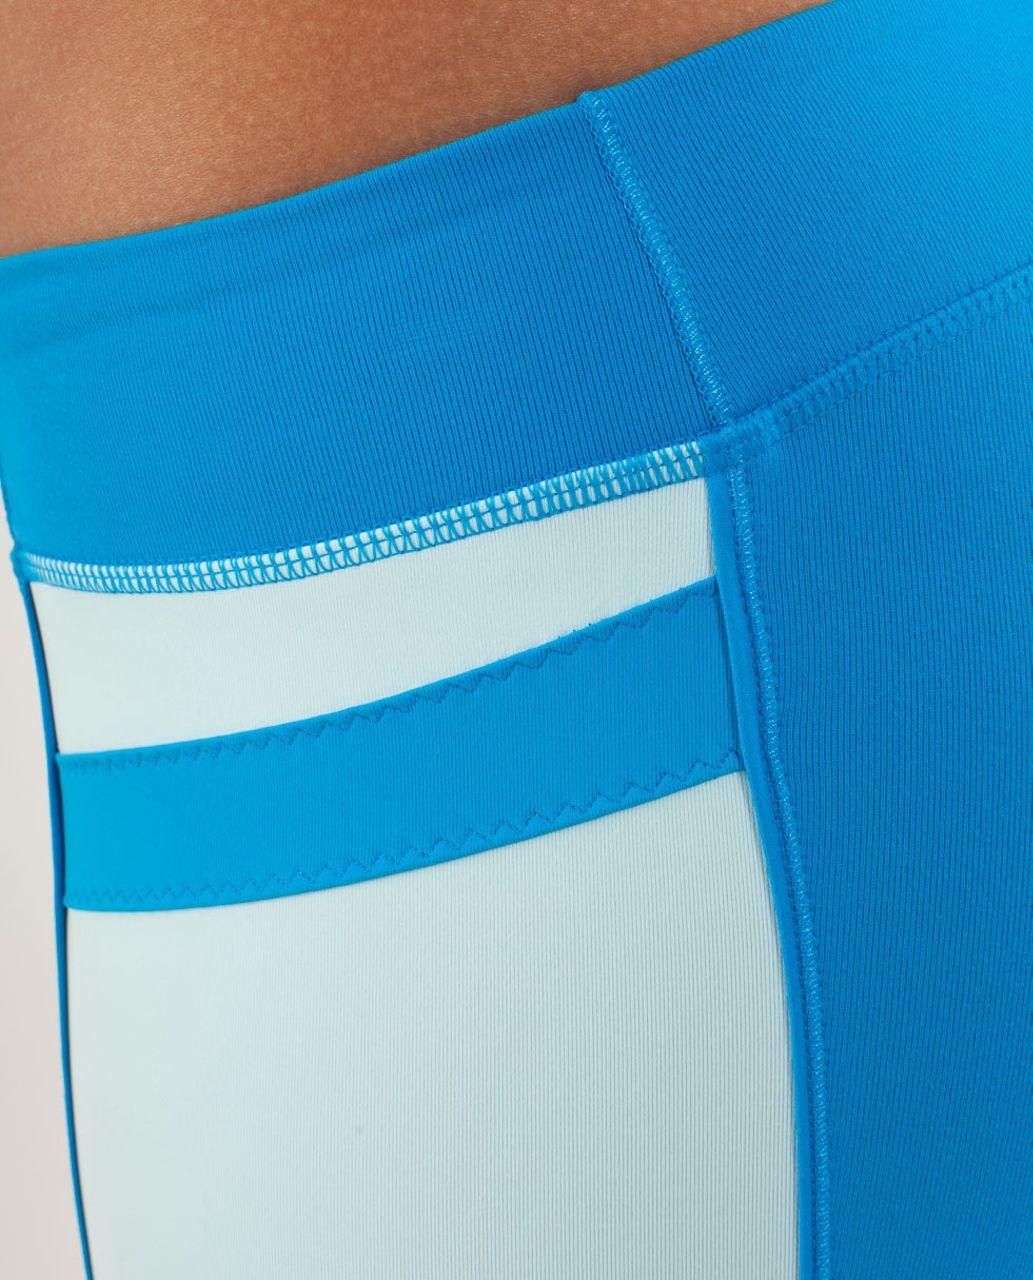 Lululemon Heat It Up Crop - Beach Blanket Blue / Aquamarine